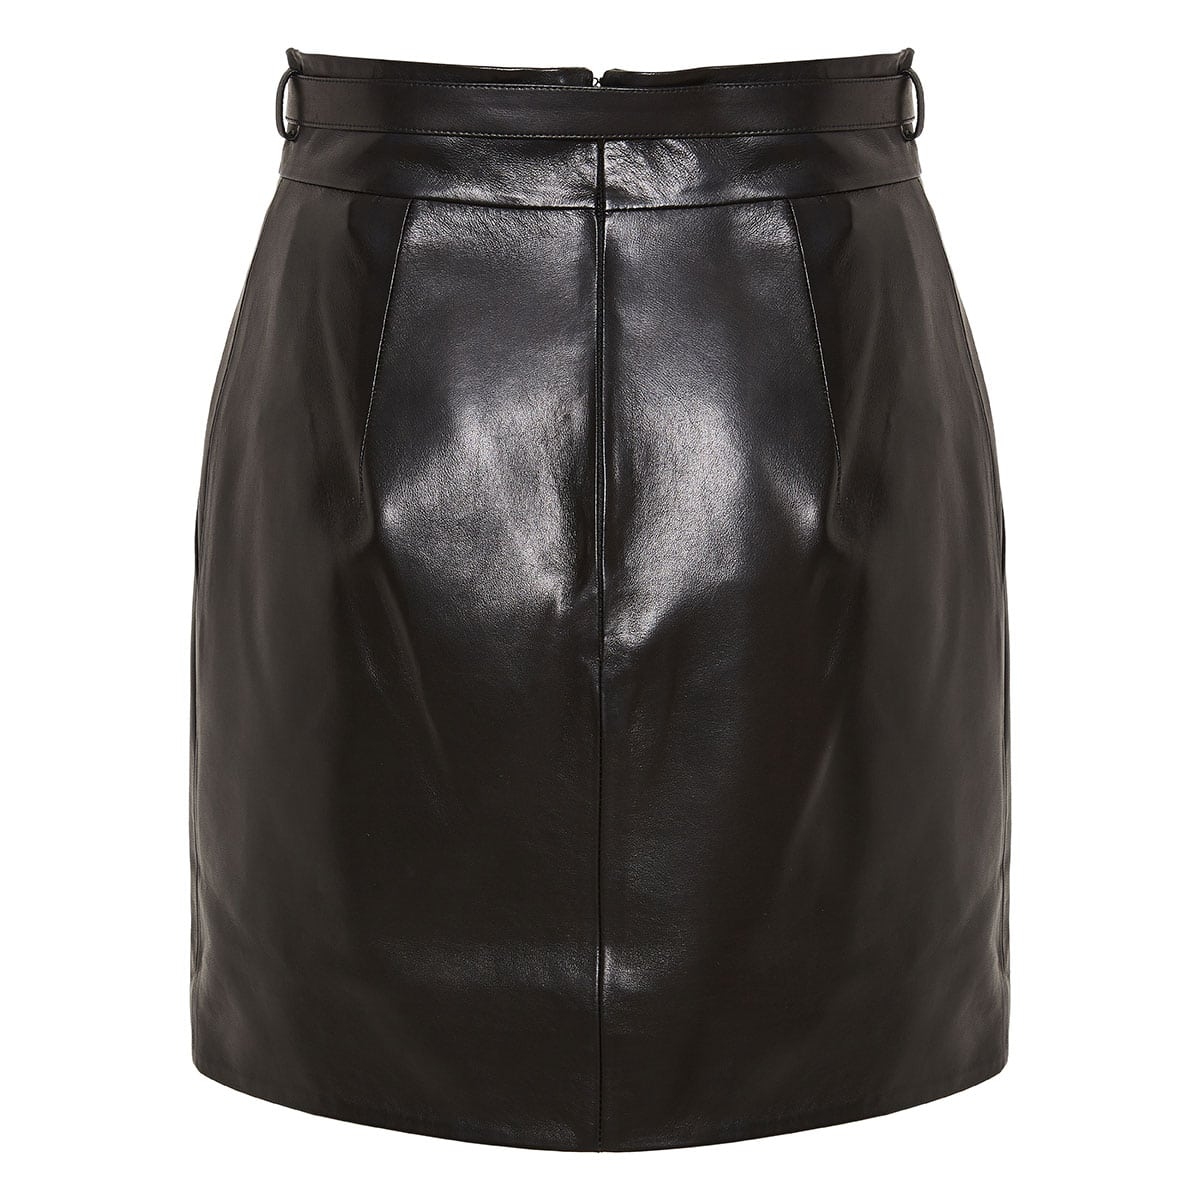 Jeweled-buckle leather mini skirt